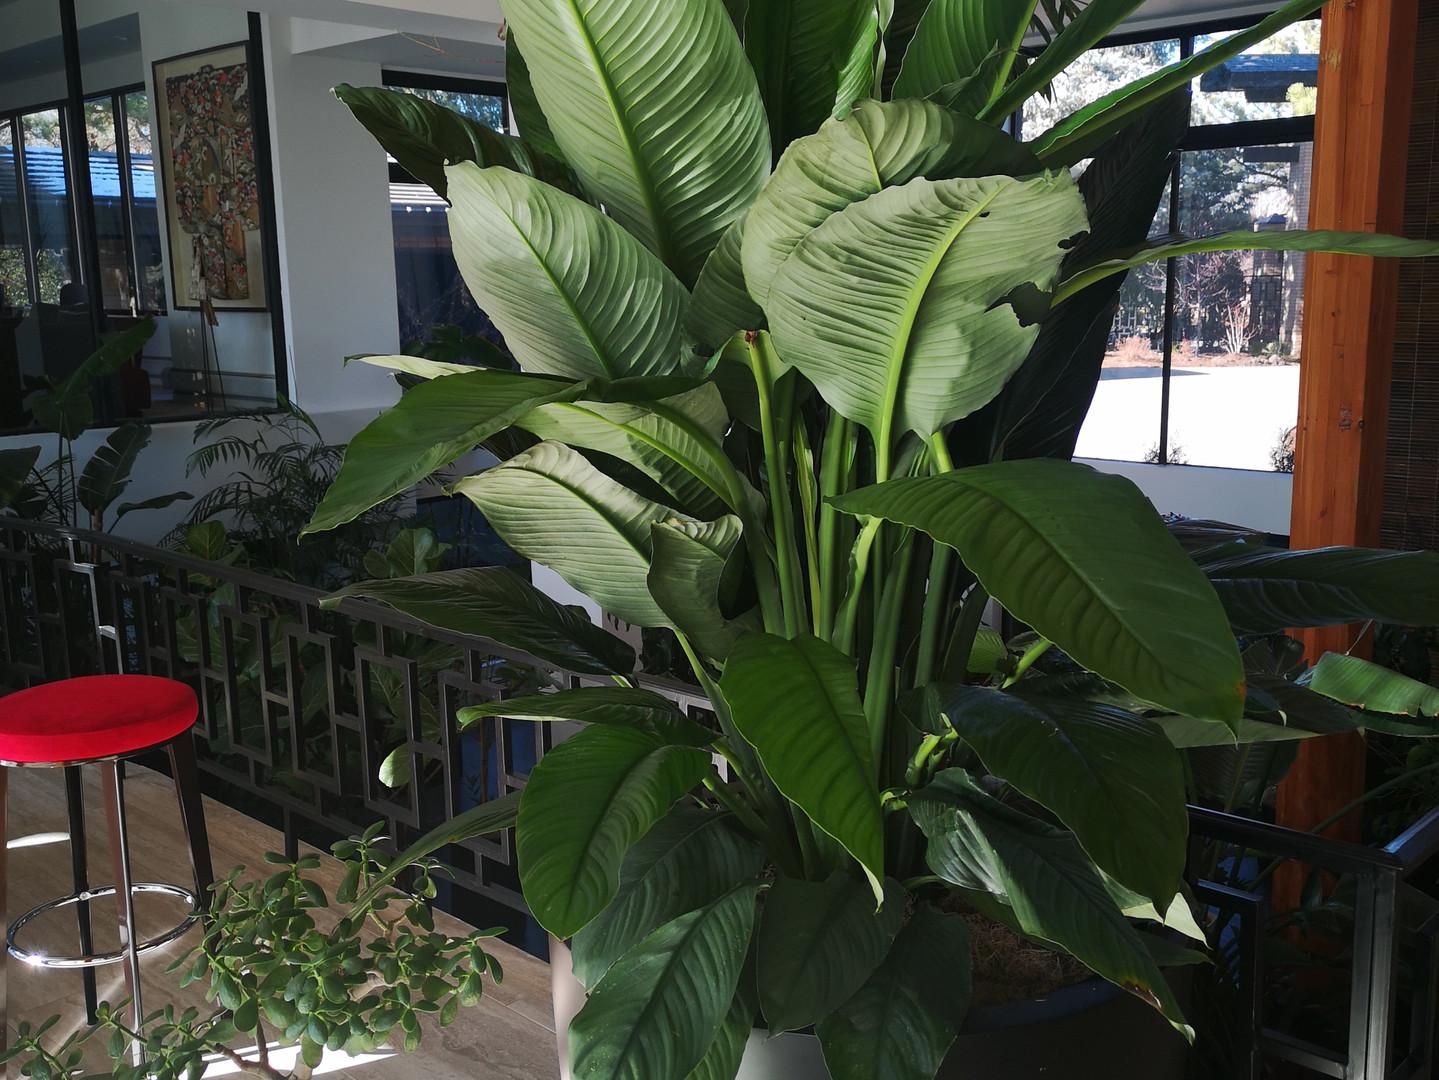 Spathiphyllum 'Sensation'